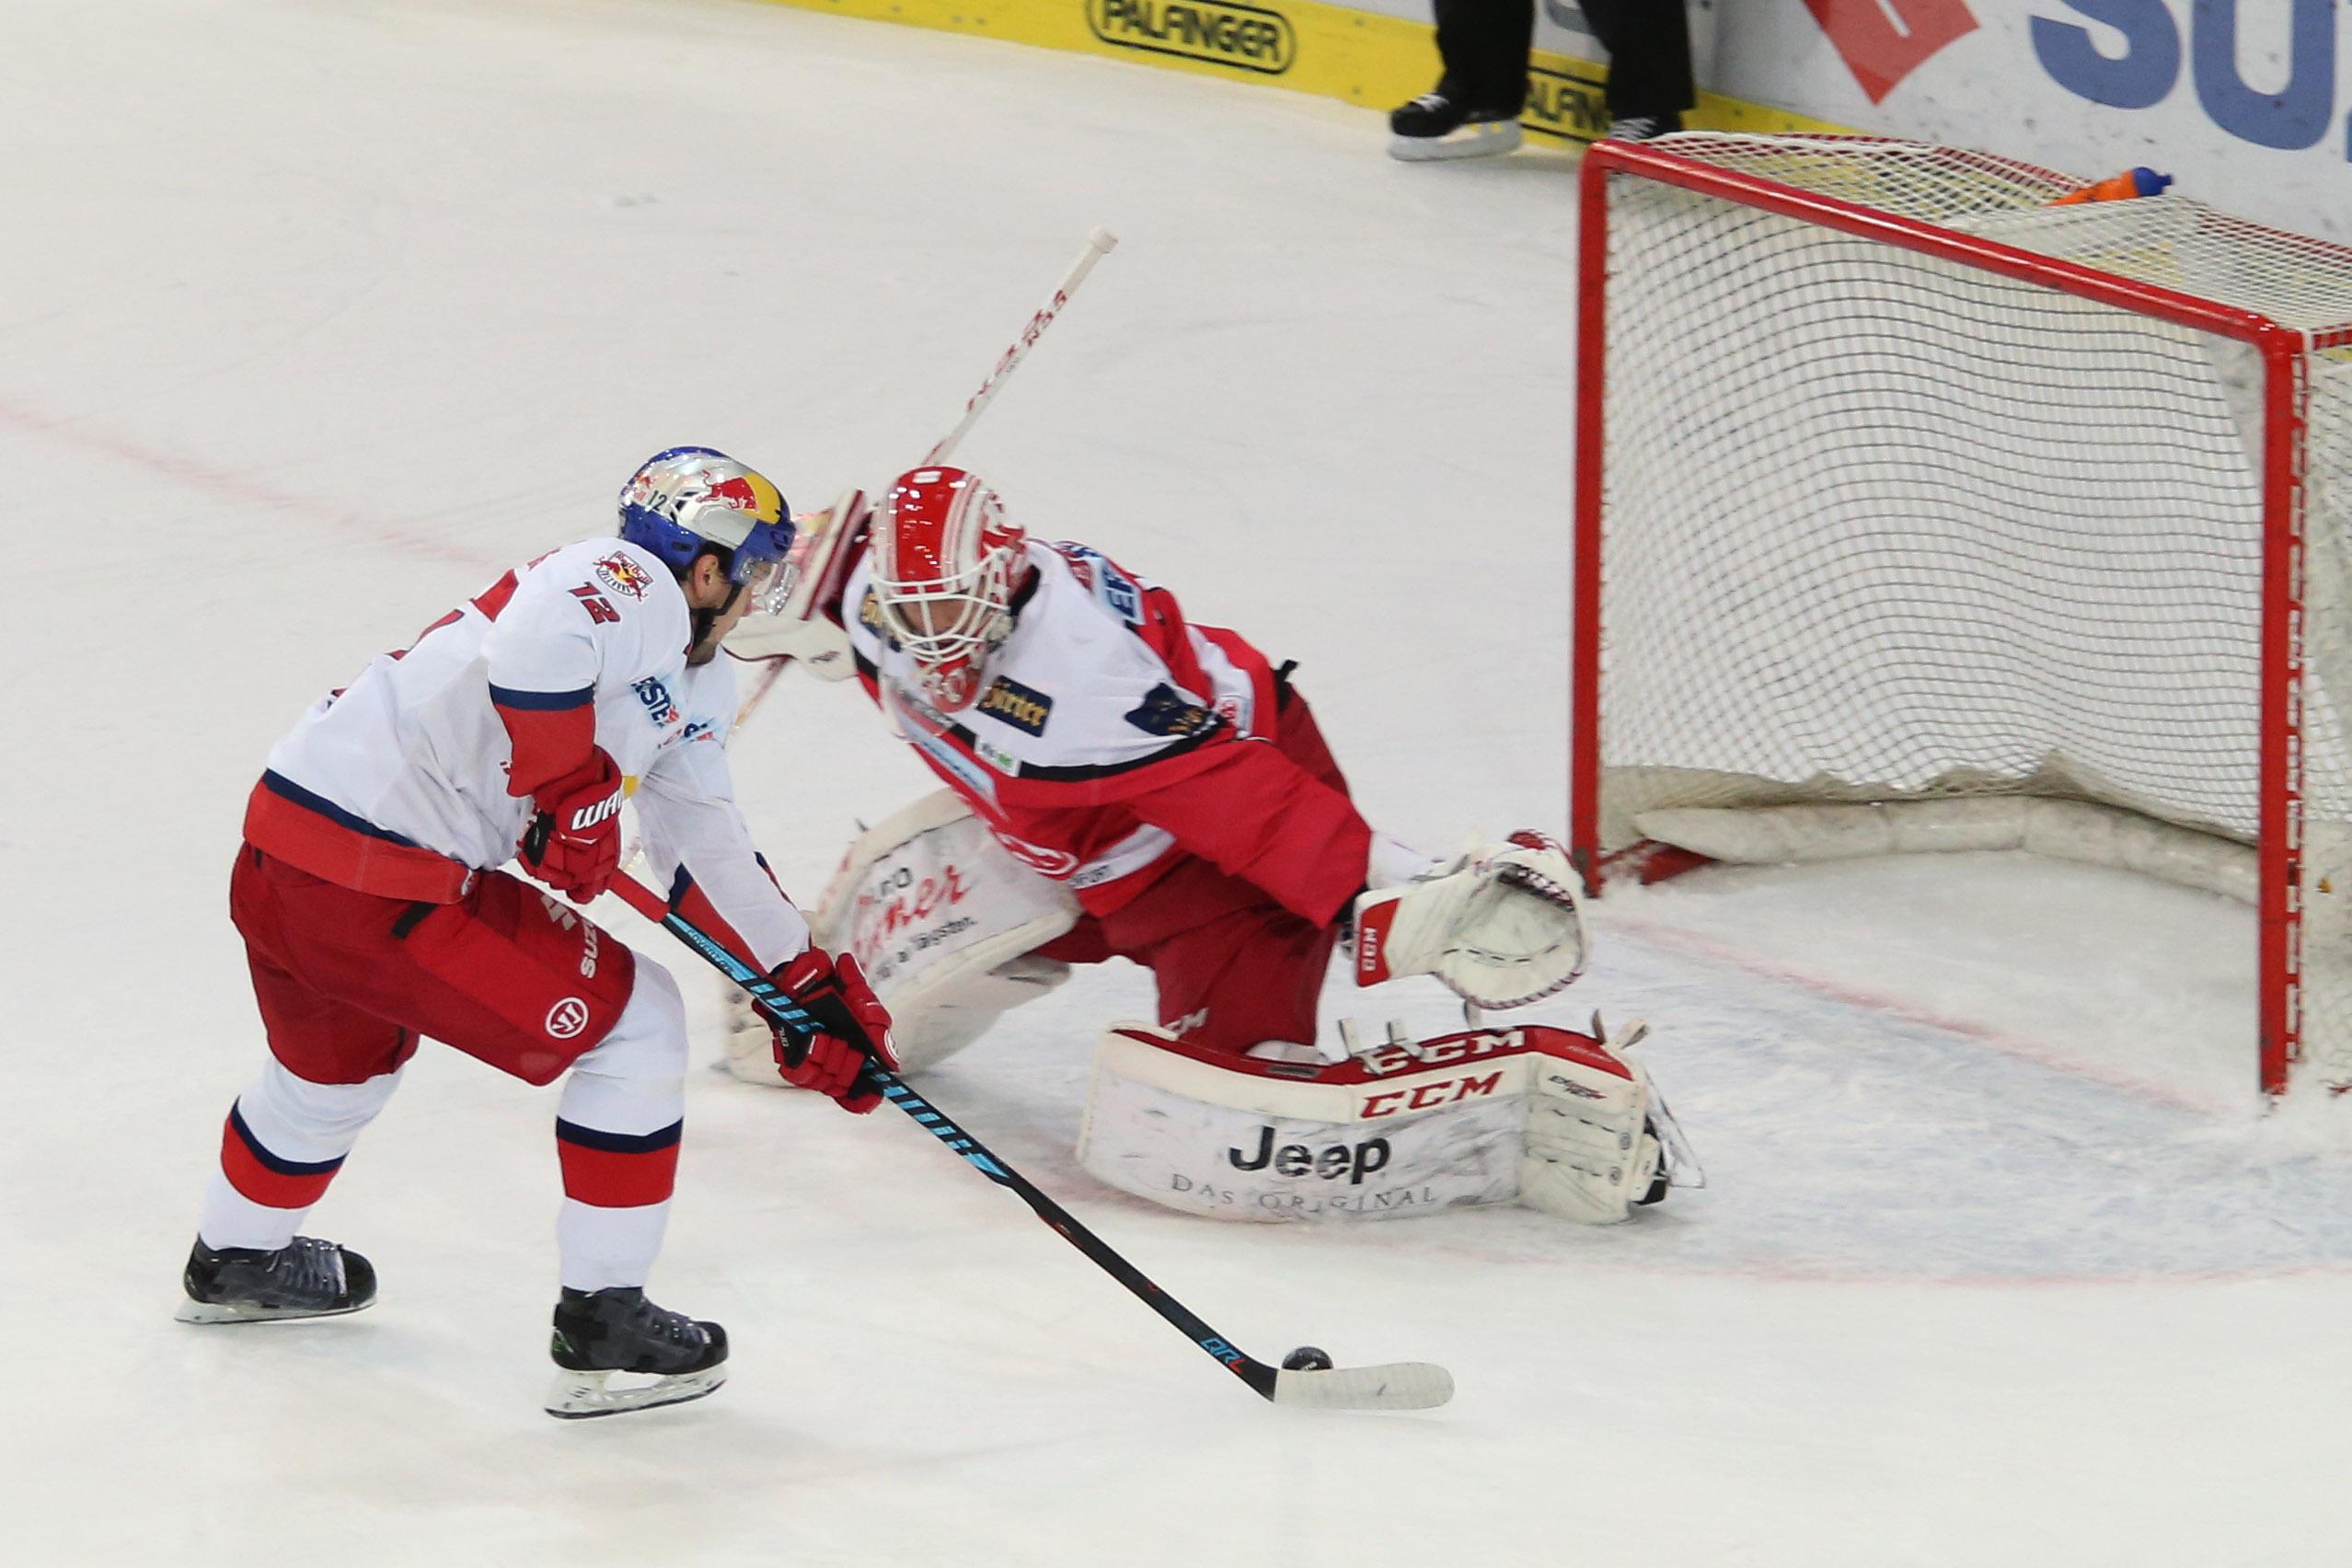 Ebel Hockey